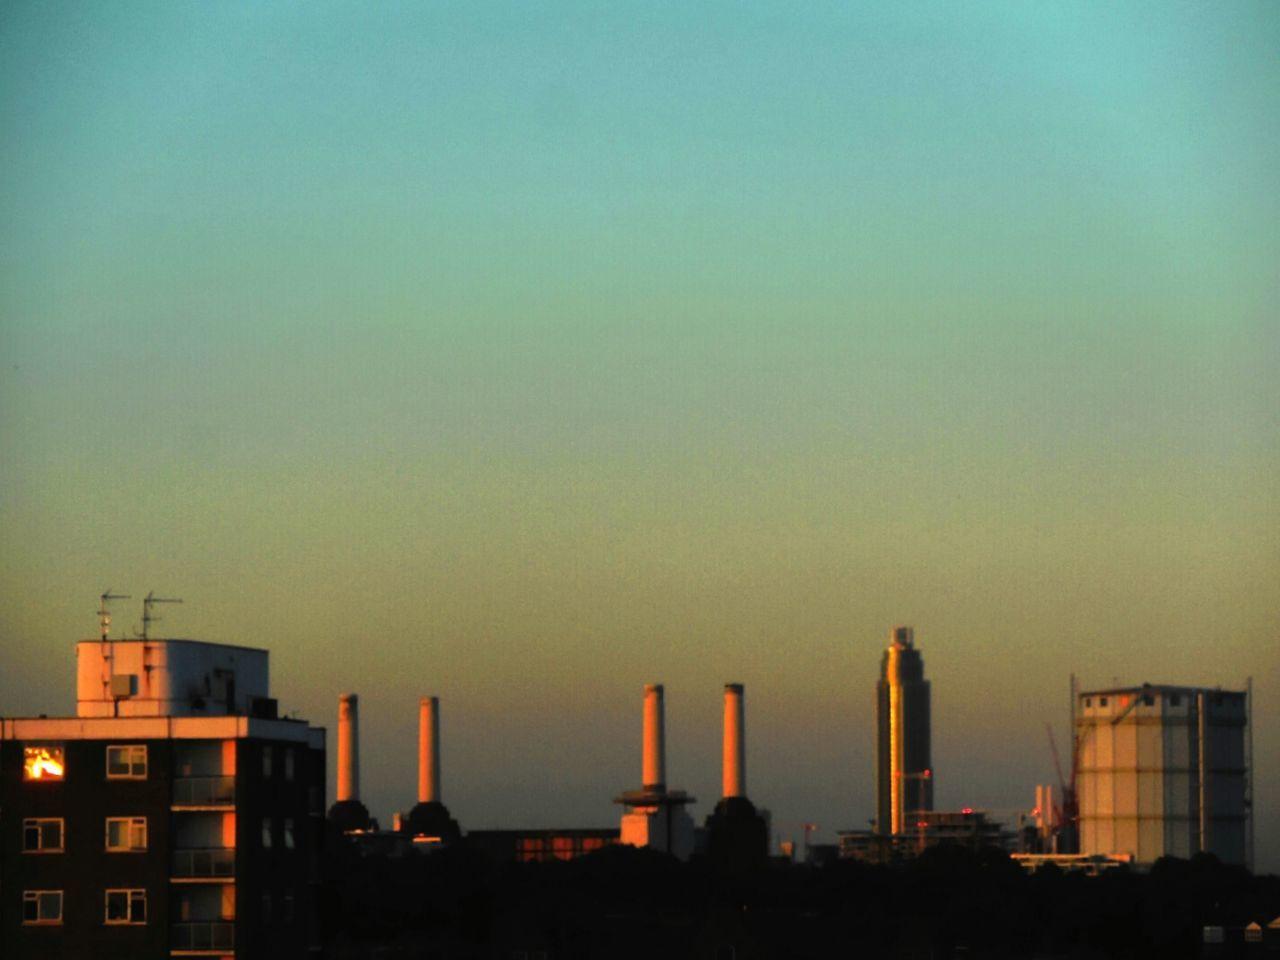 Battersea Power Station at sunset last night.